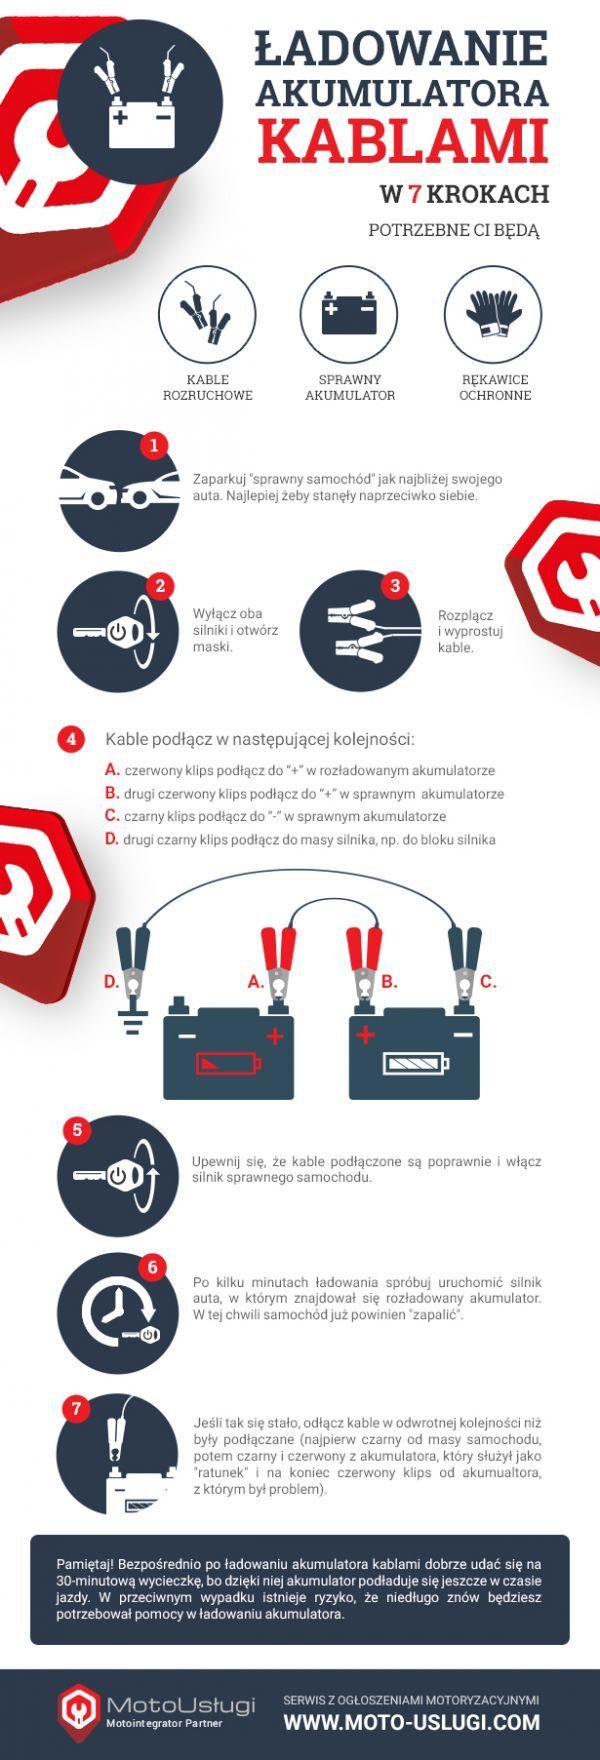 Jak ładować akumulator kablami? Infografika